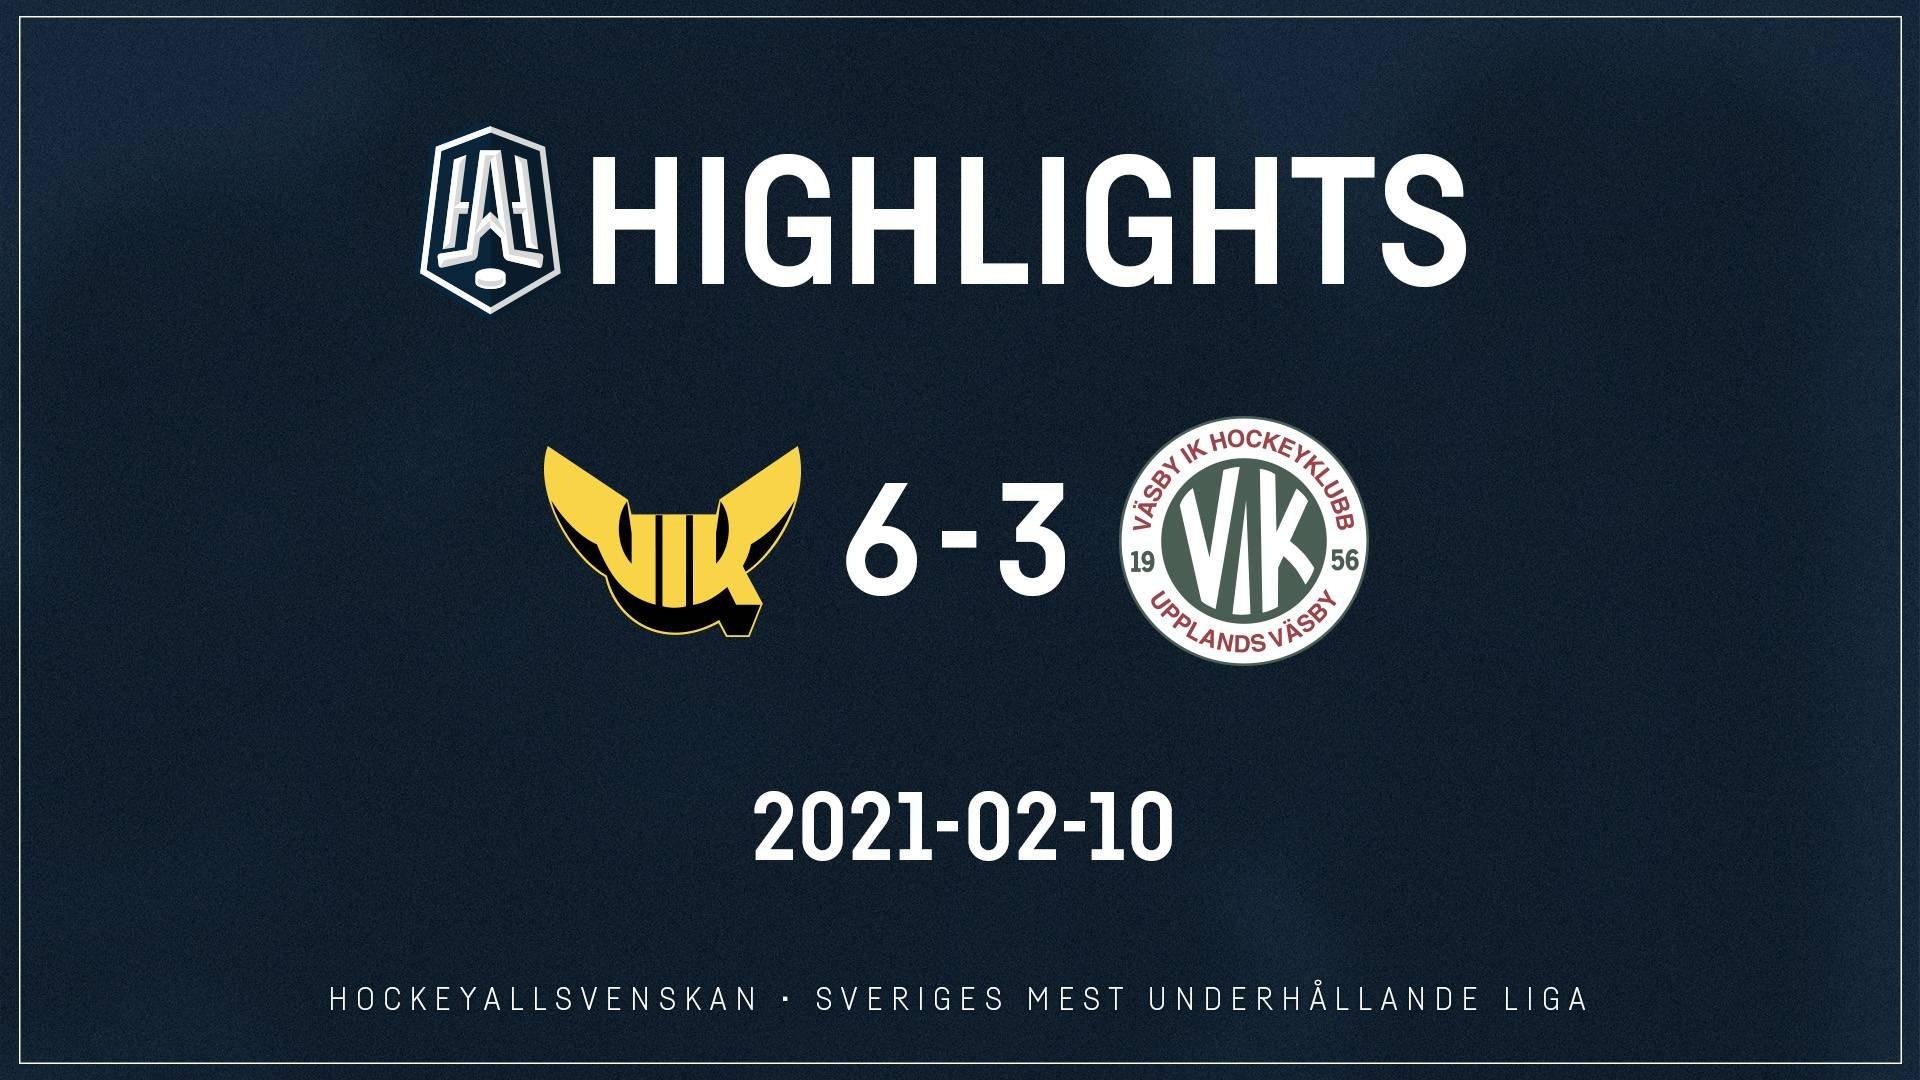 2021-02-10 Västerås - Väsby 6-3